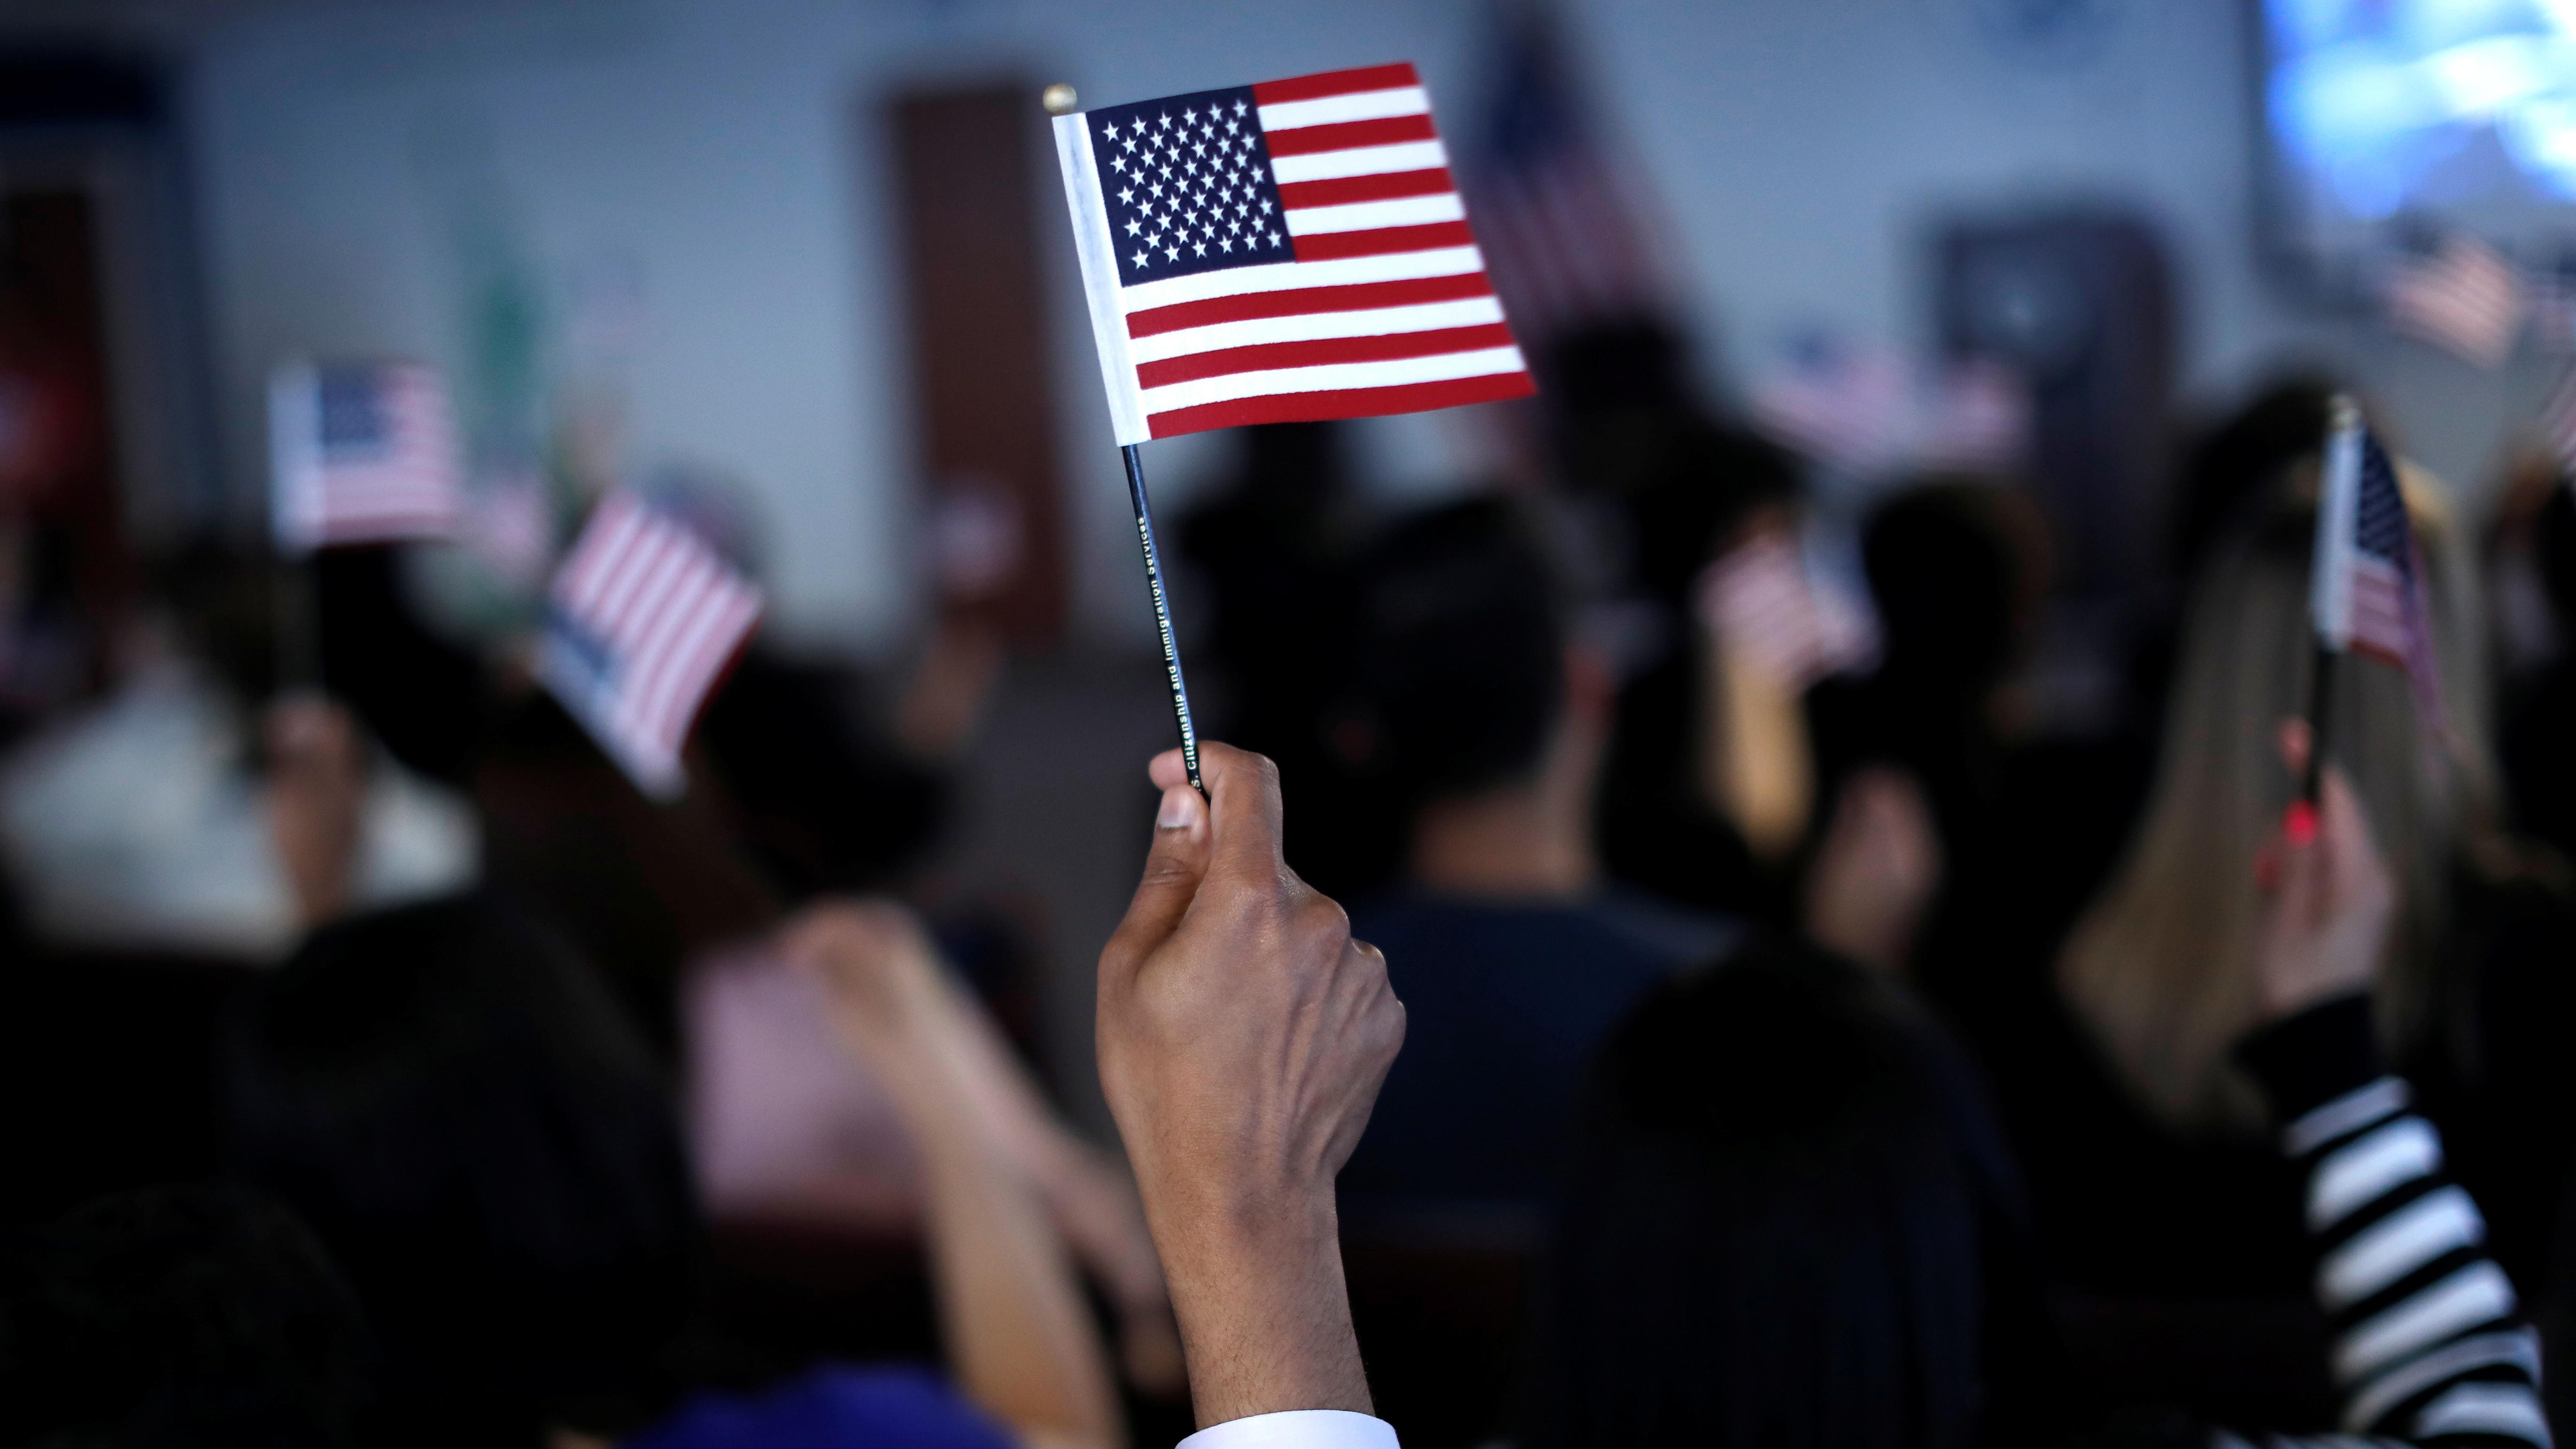 A hand waving a small American flag